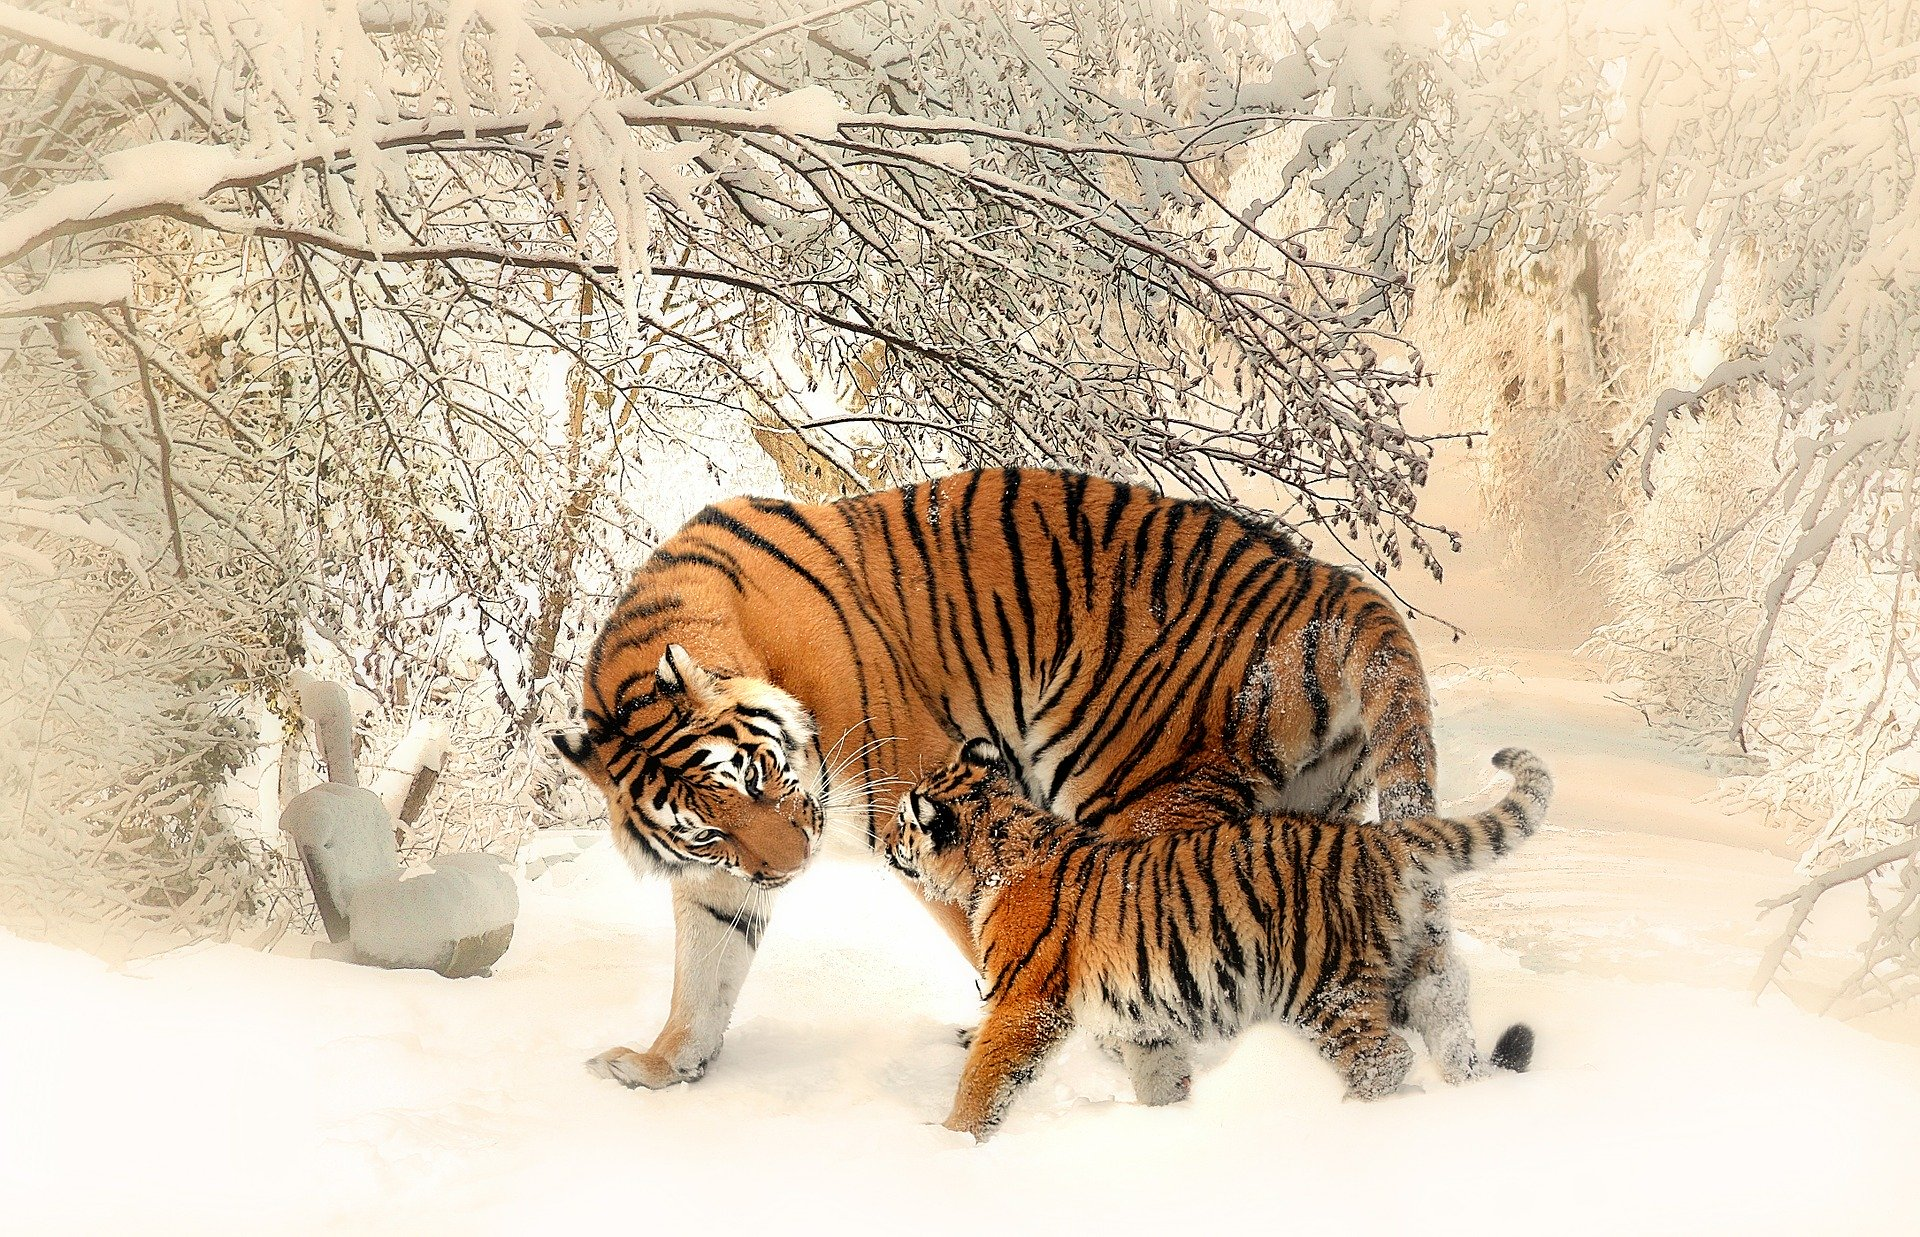 tiger-and-cub